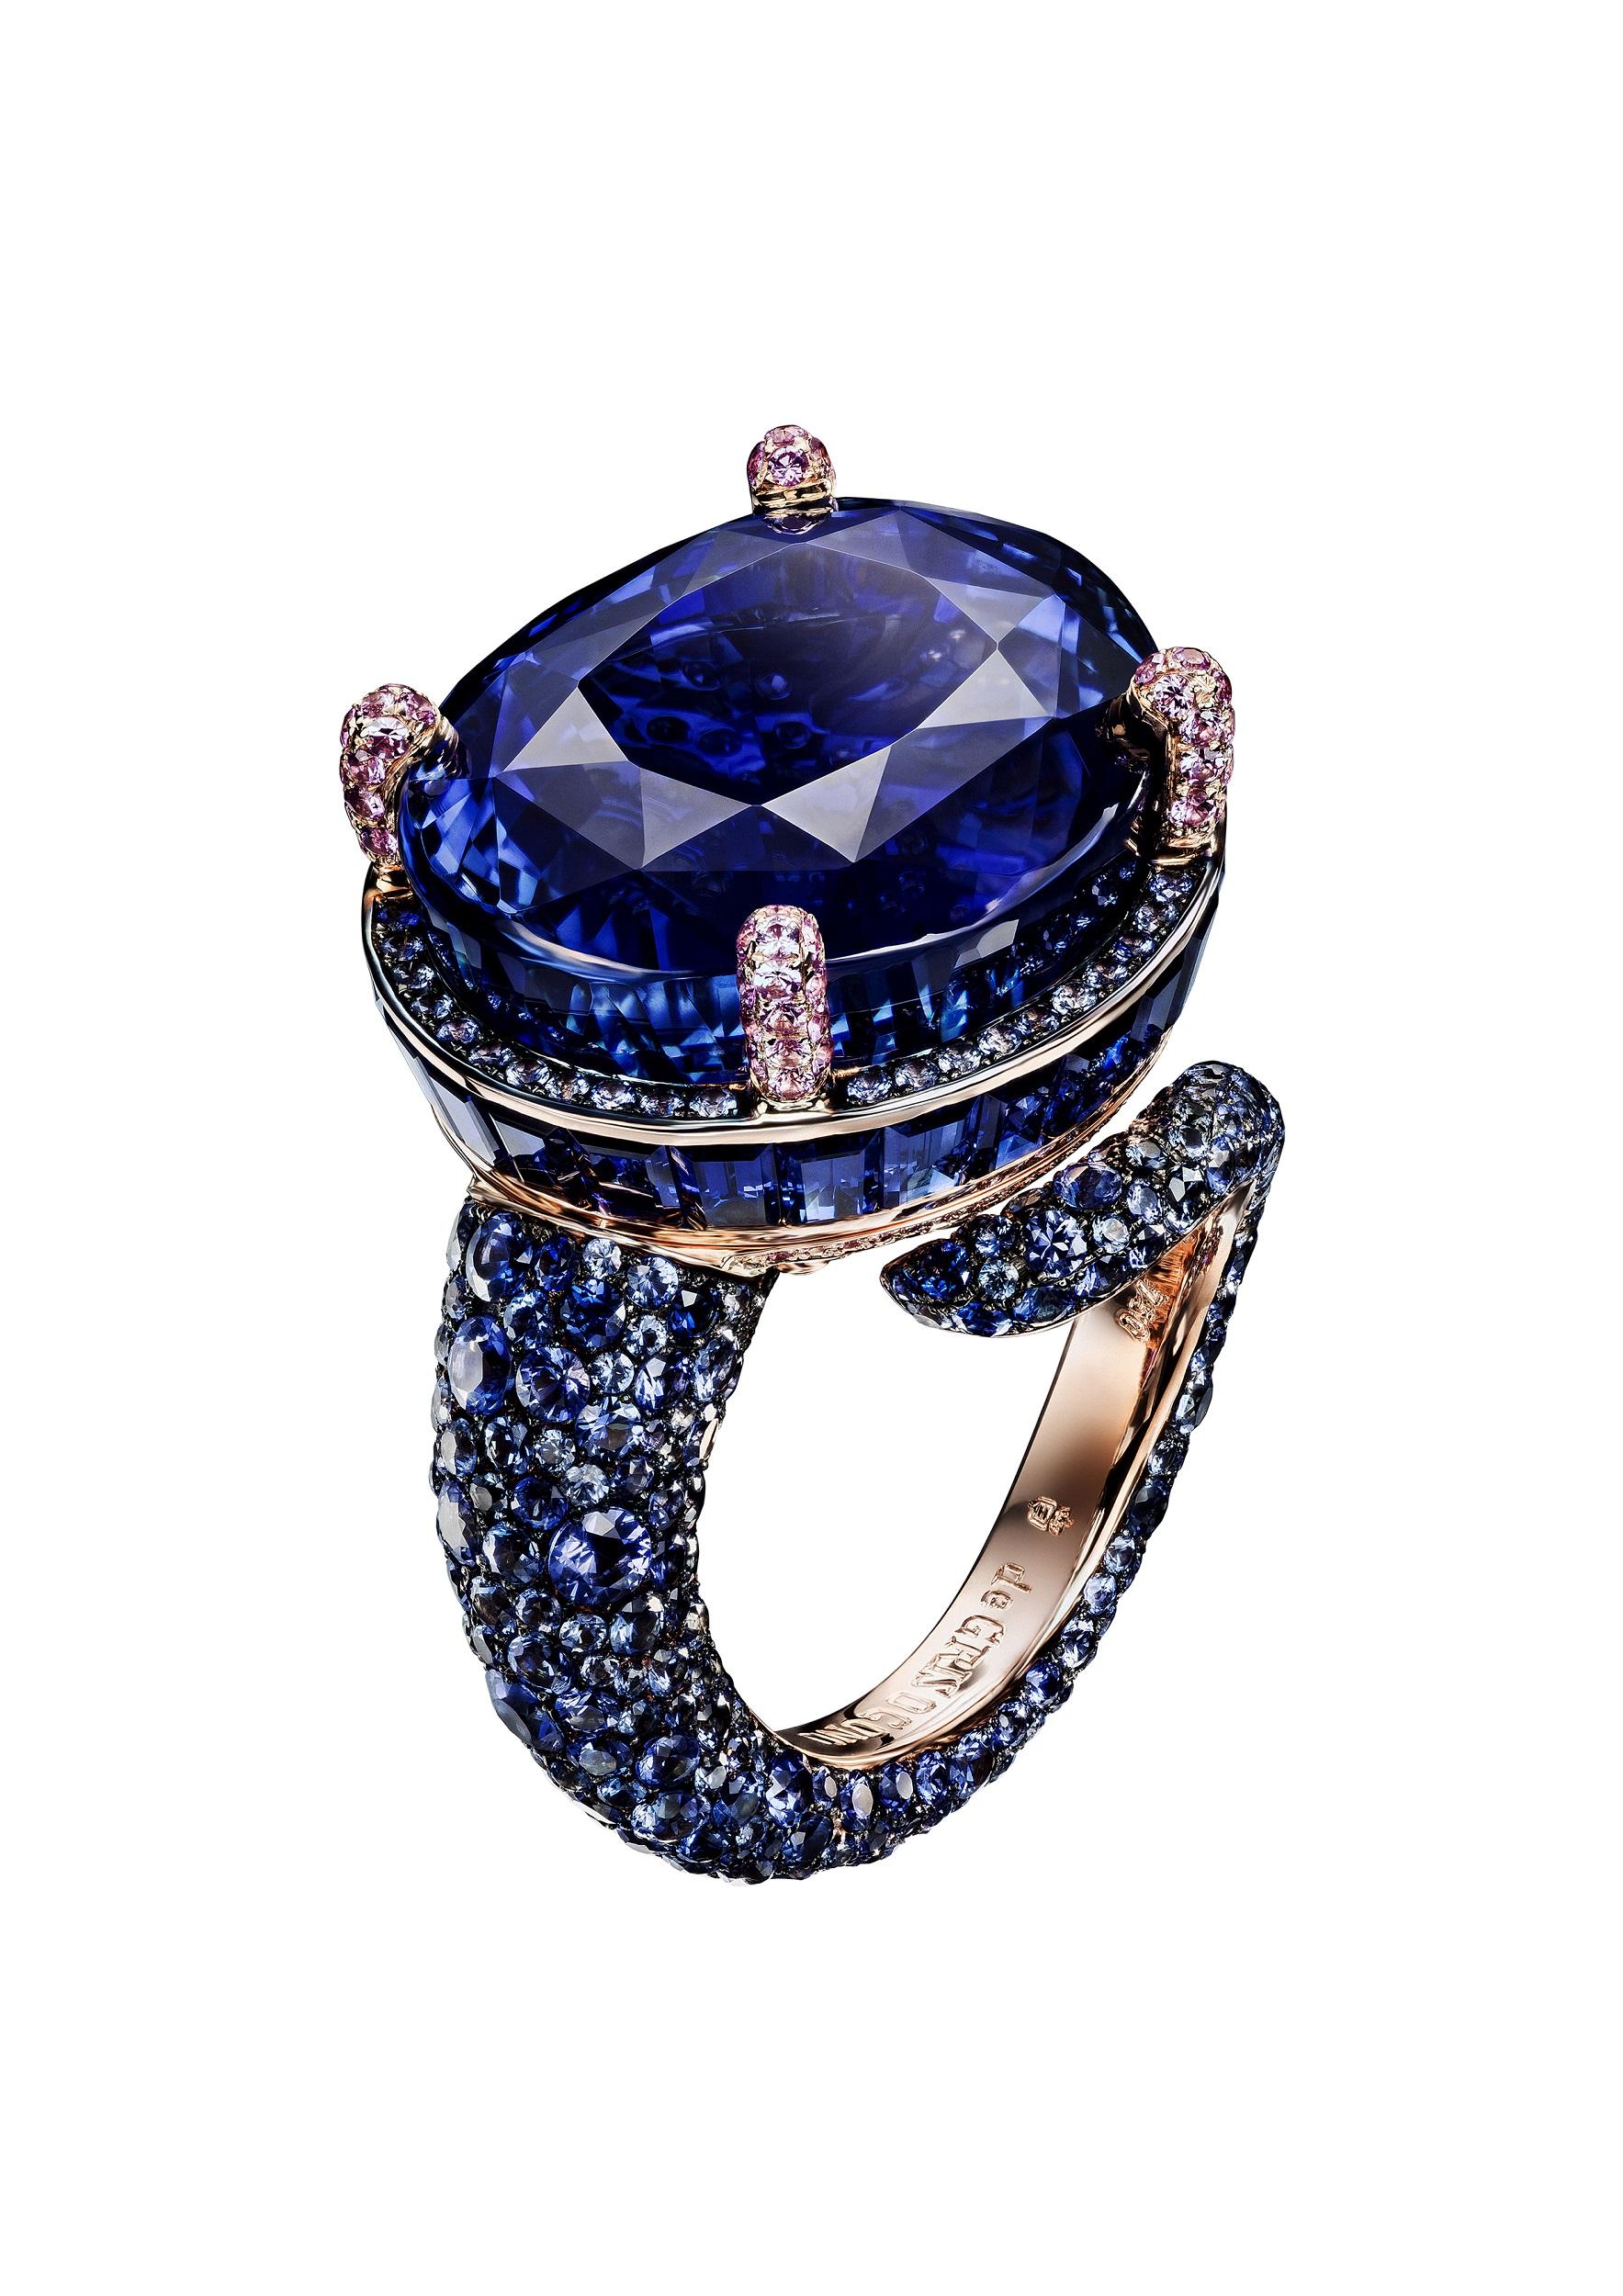 de Grisogono Sapphire and Gold